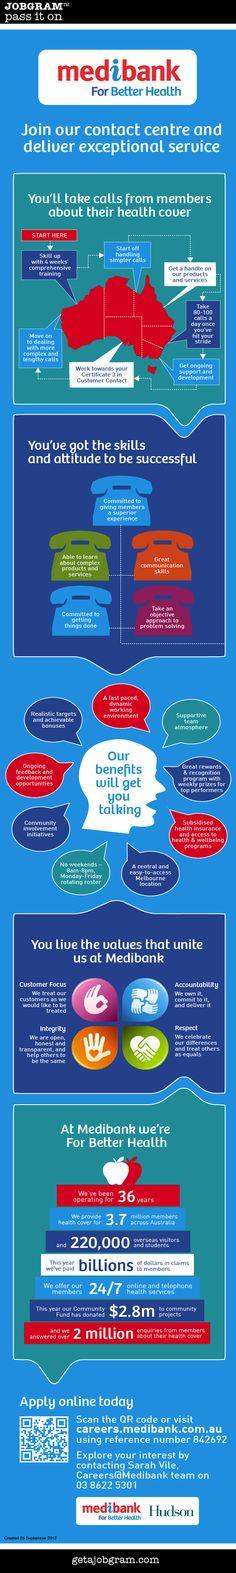 Medibank Contact Centre Health Insurance Humor